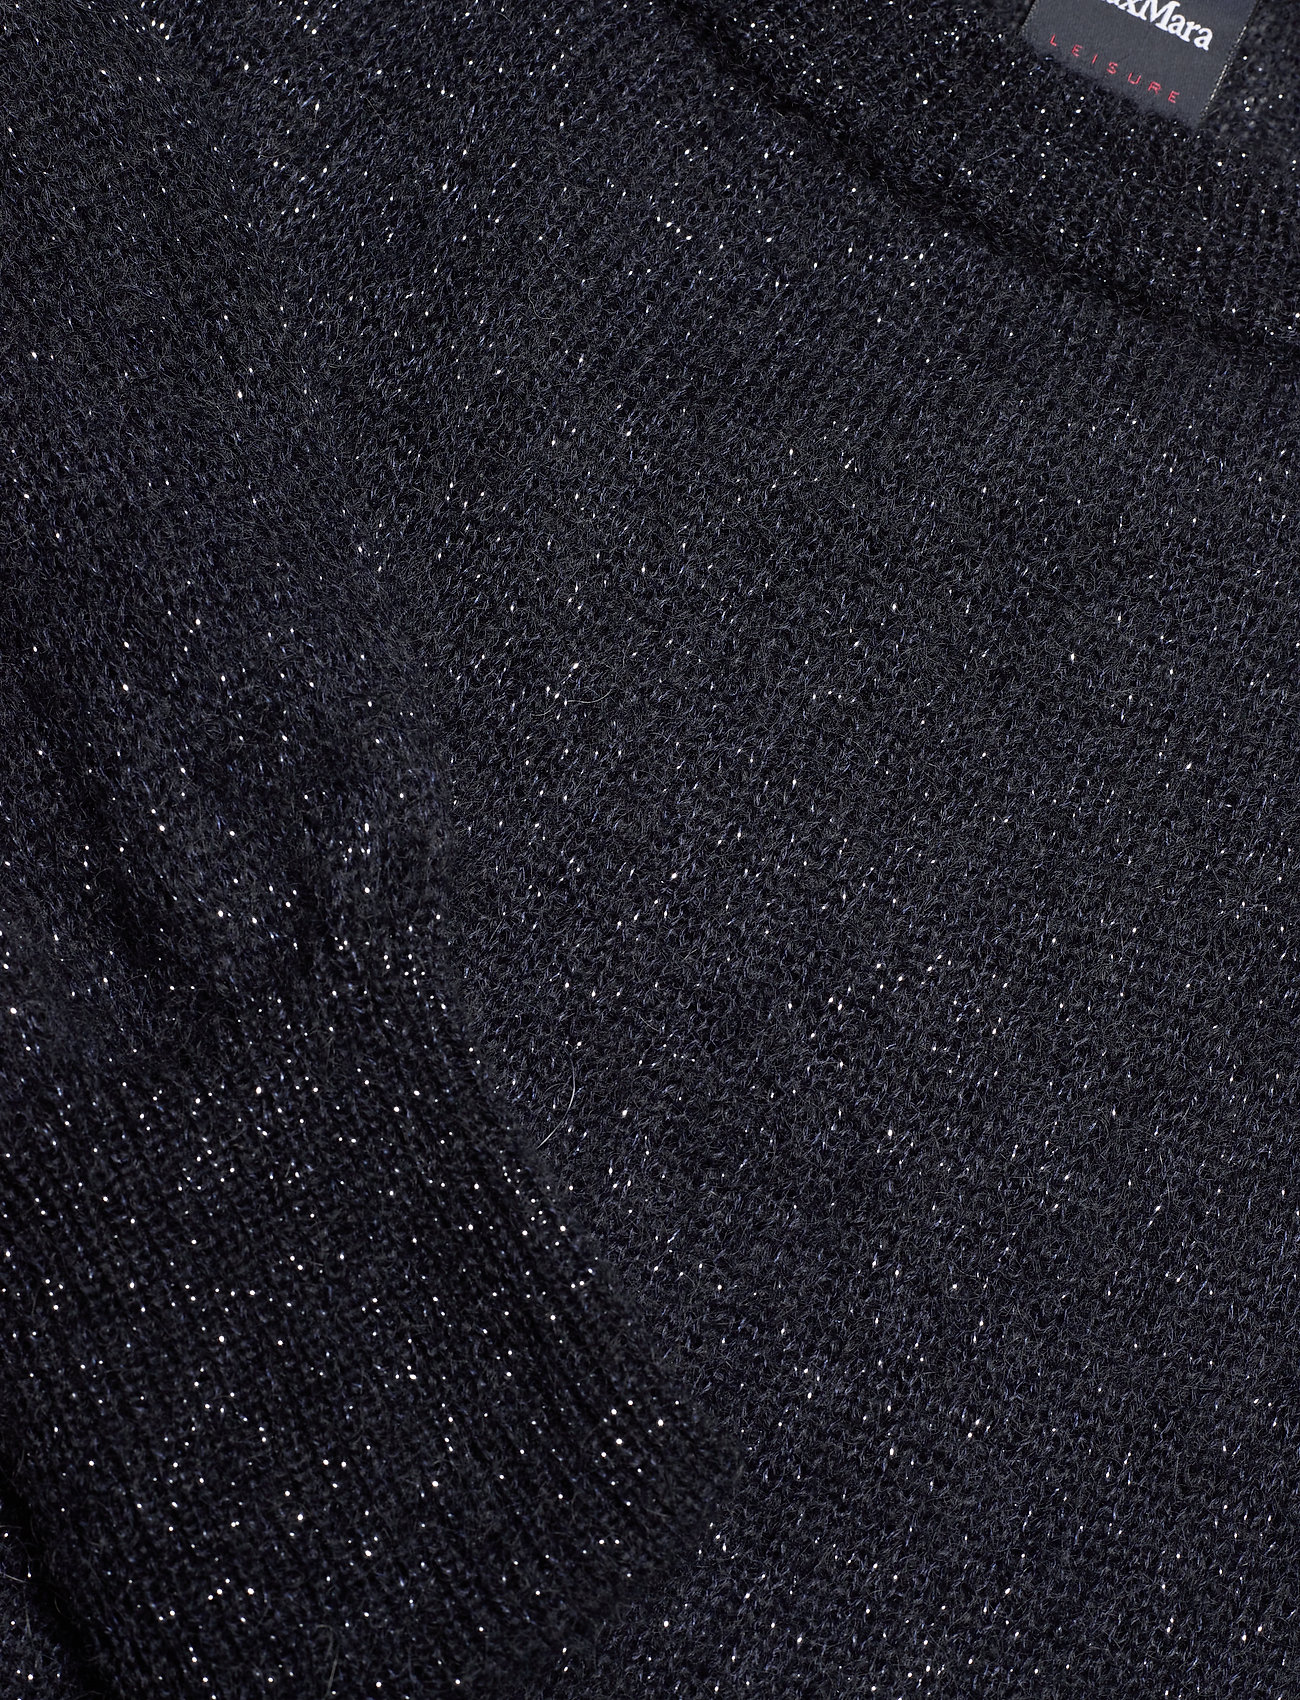 Max Mara Leisure - PILADE - sweaters - navy - 2